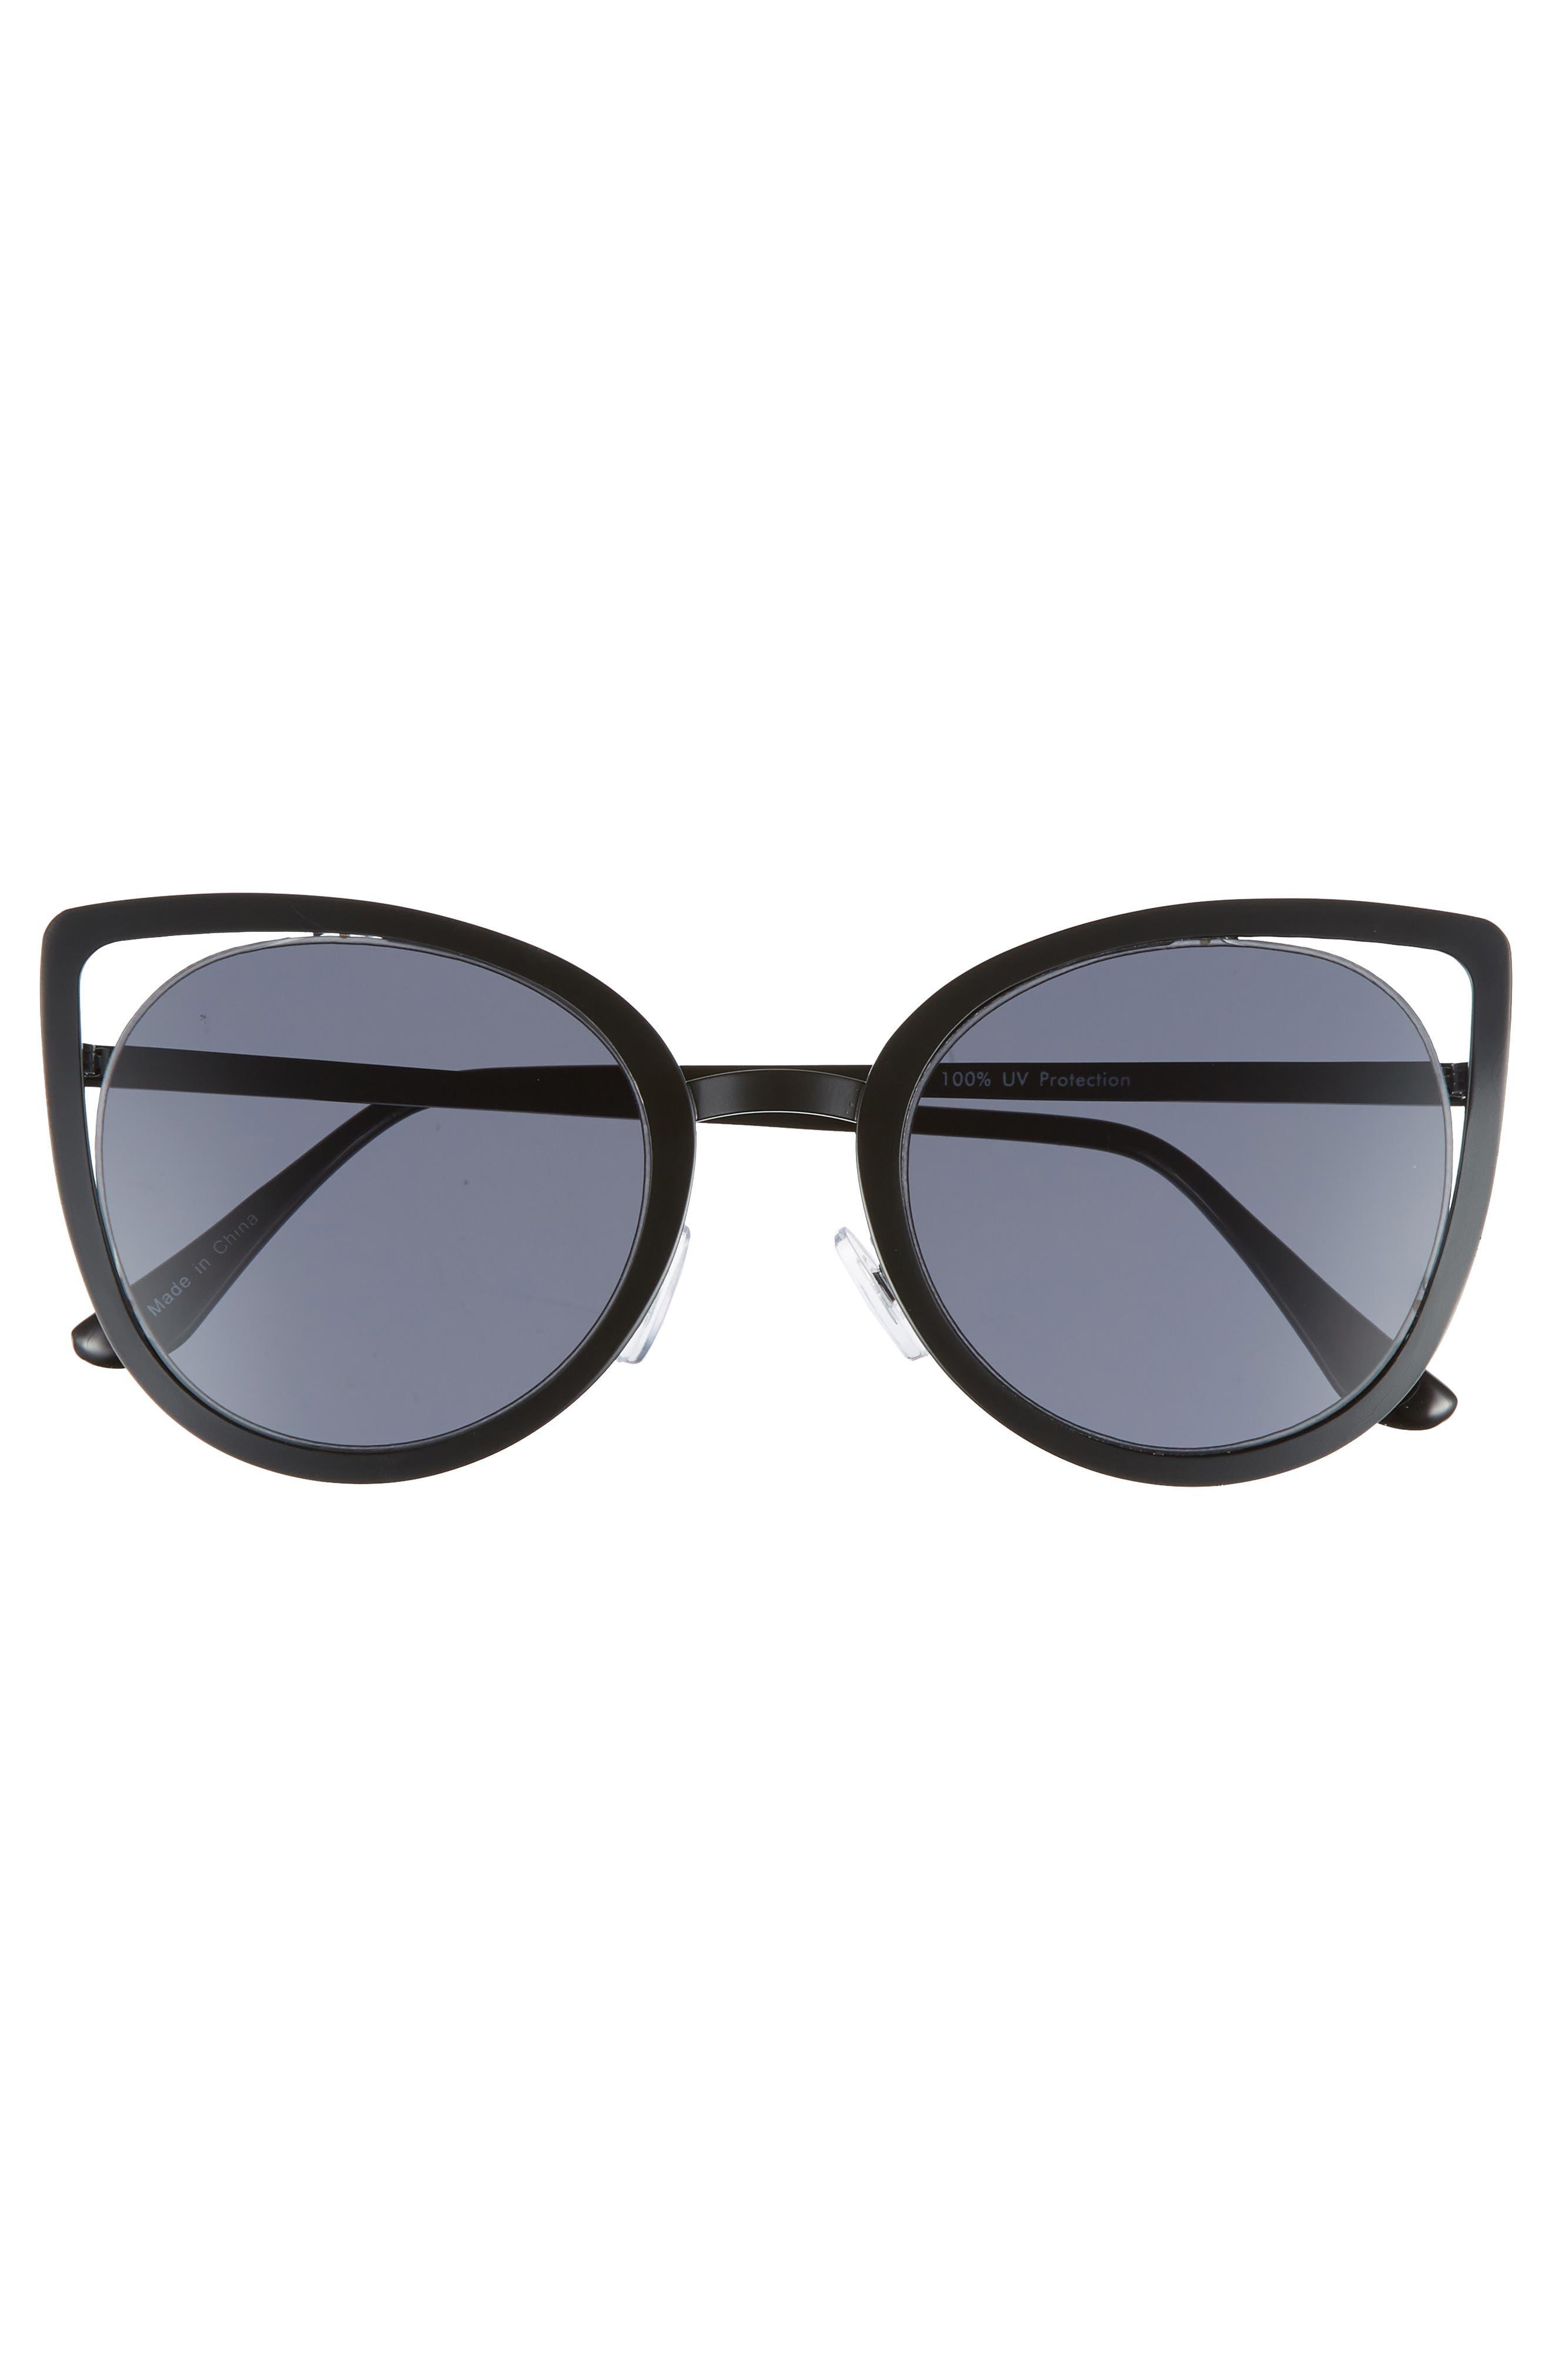 53mm Cutout Cat Eye Sunglasses,                             Alternate thumbnail 3, color,                             001